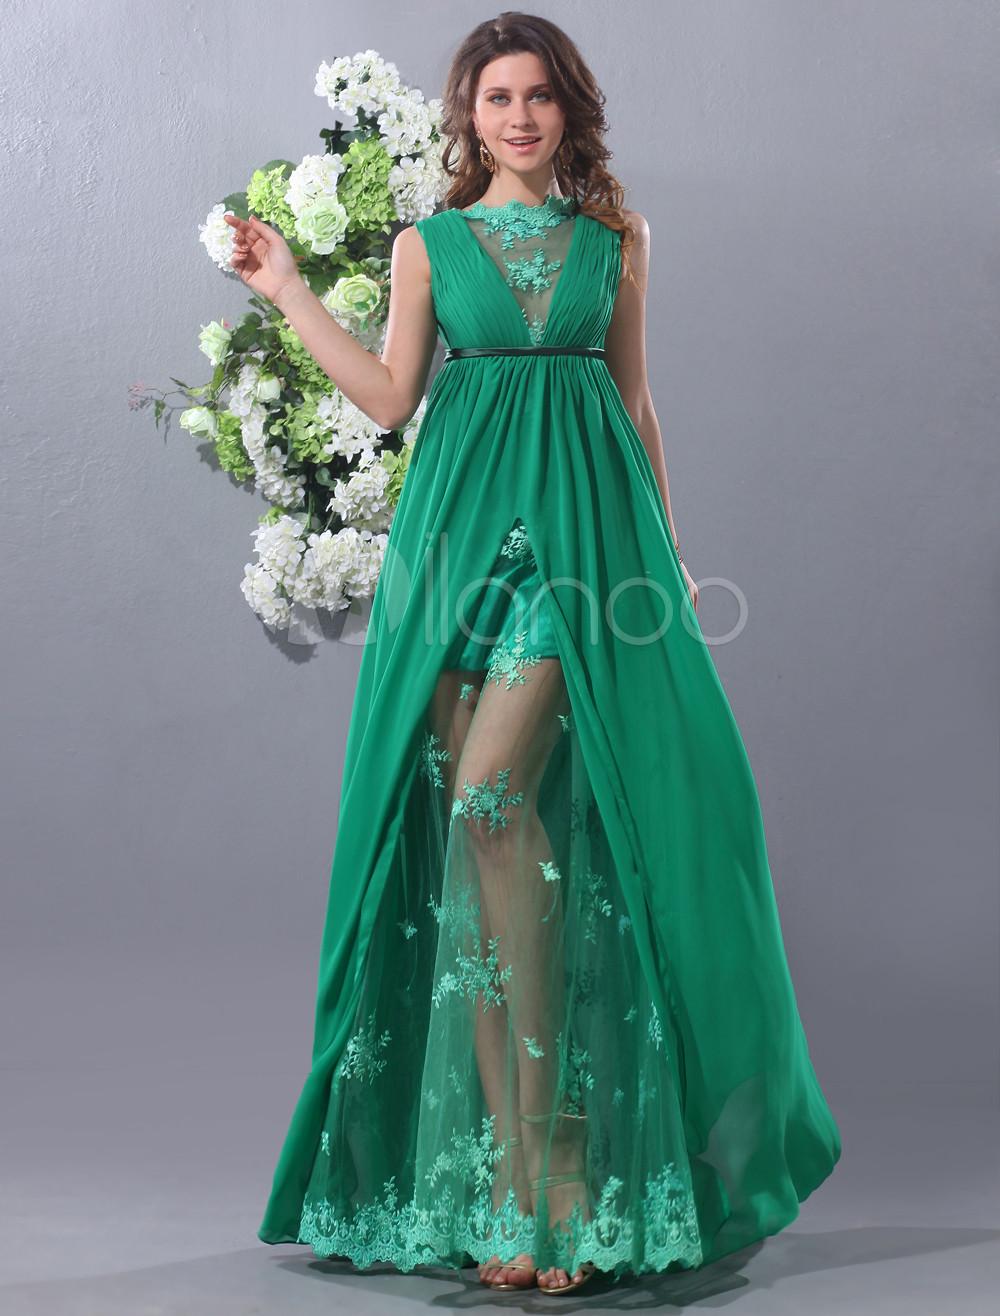 A-line V-Neck Lace Green Chiffon Prom Dress Milanoo